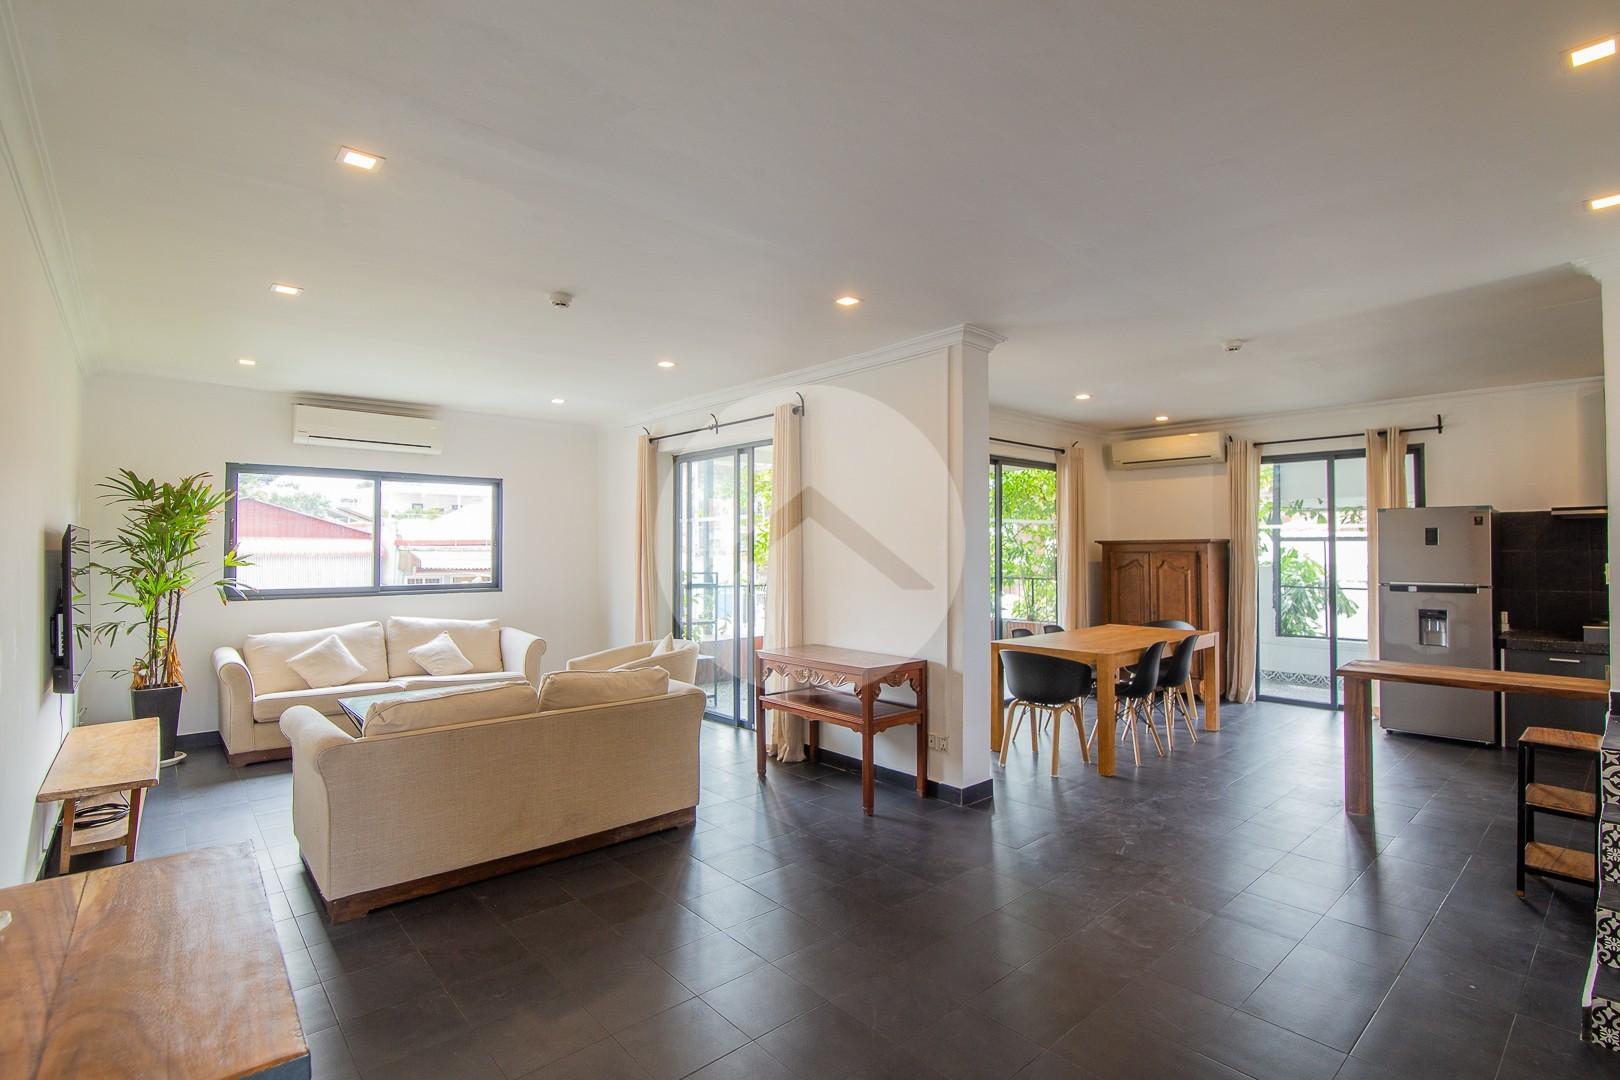 3 Bedroom Renovated Apartment For Rent - Chaktomuk, Phnom Penh